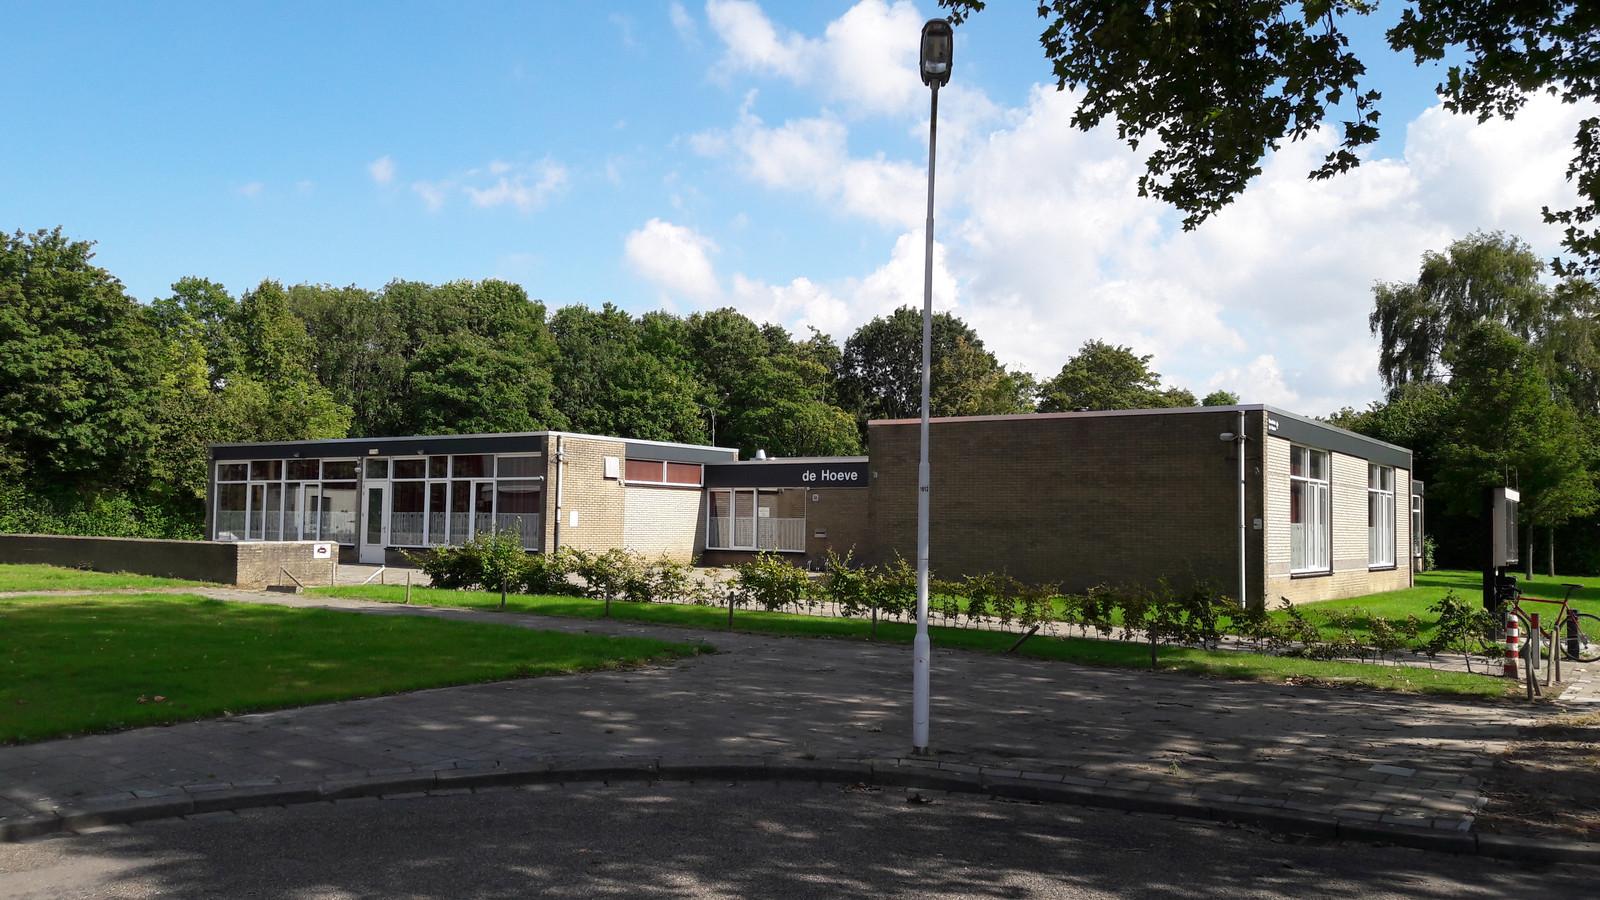 Buurthuis De Hoeve aan de Edvard Grieghof in de Terneuzense wijk Oudelandse Hoeve.